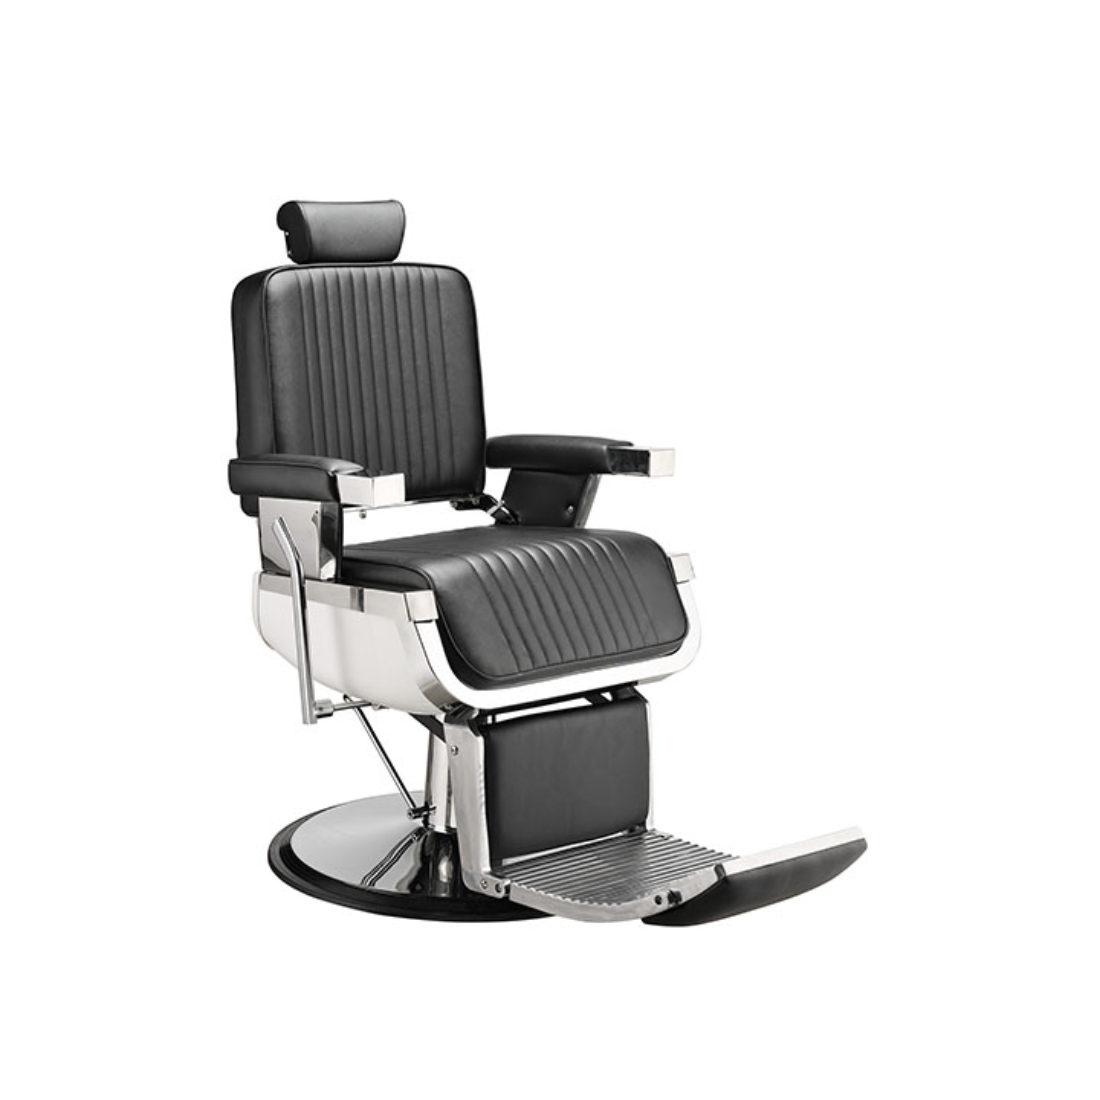 DDUUEETT FRO Barbers Chair